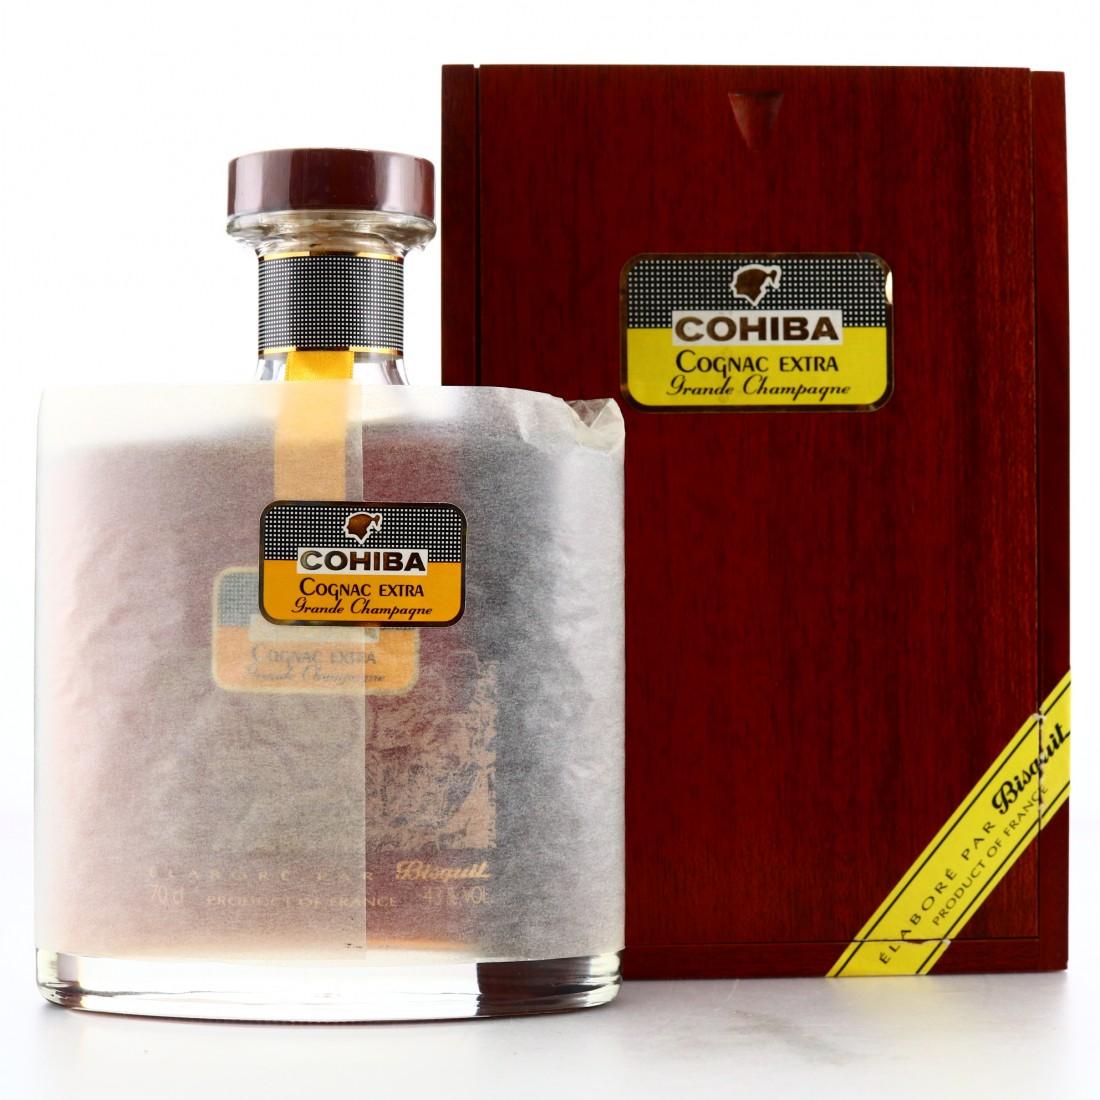 Bisquit Cohiba Cognac Extra Grand Champagne